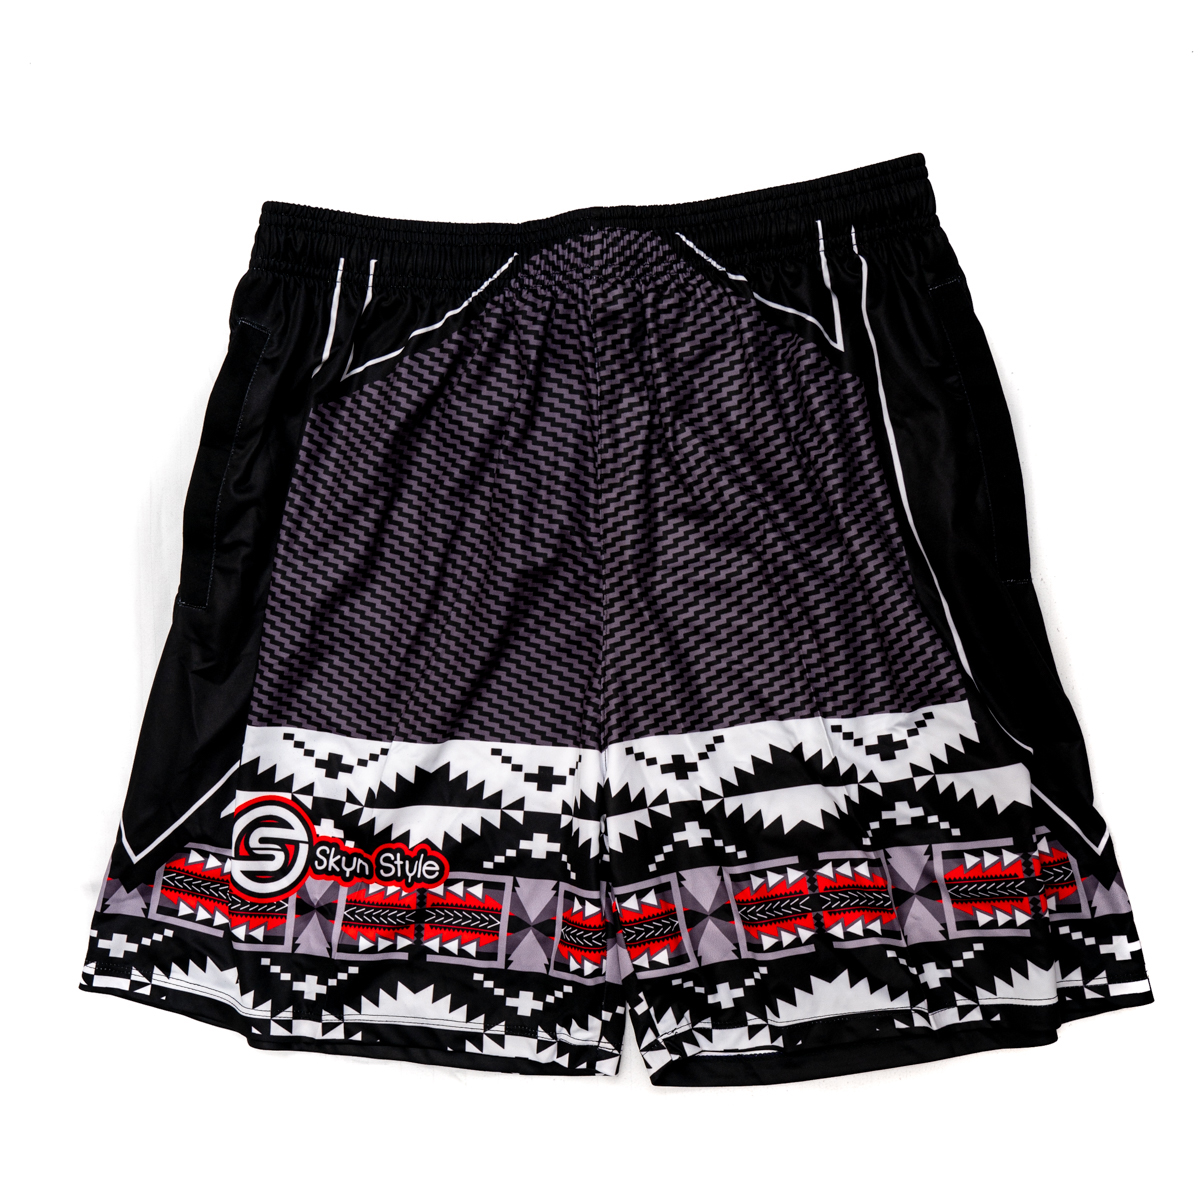 SkynStyle_Shorts.jpg